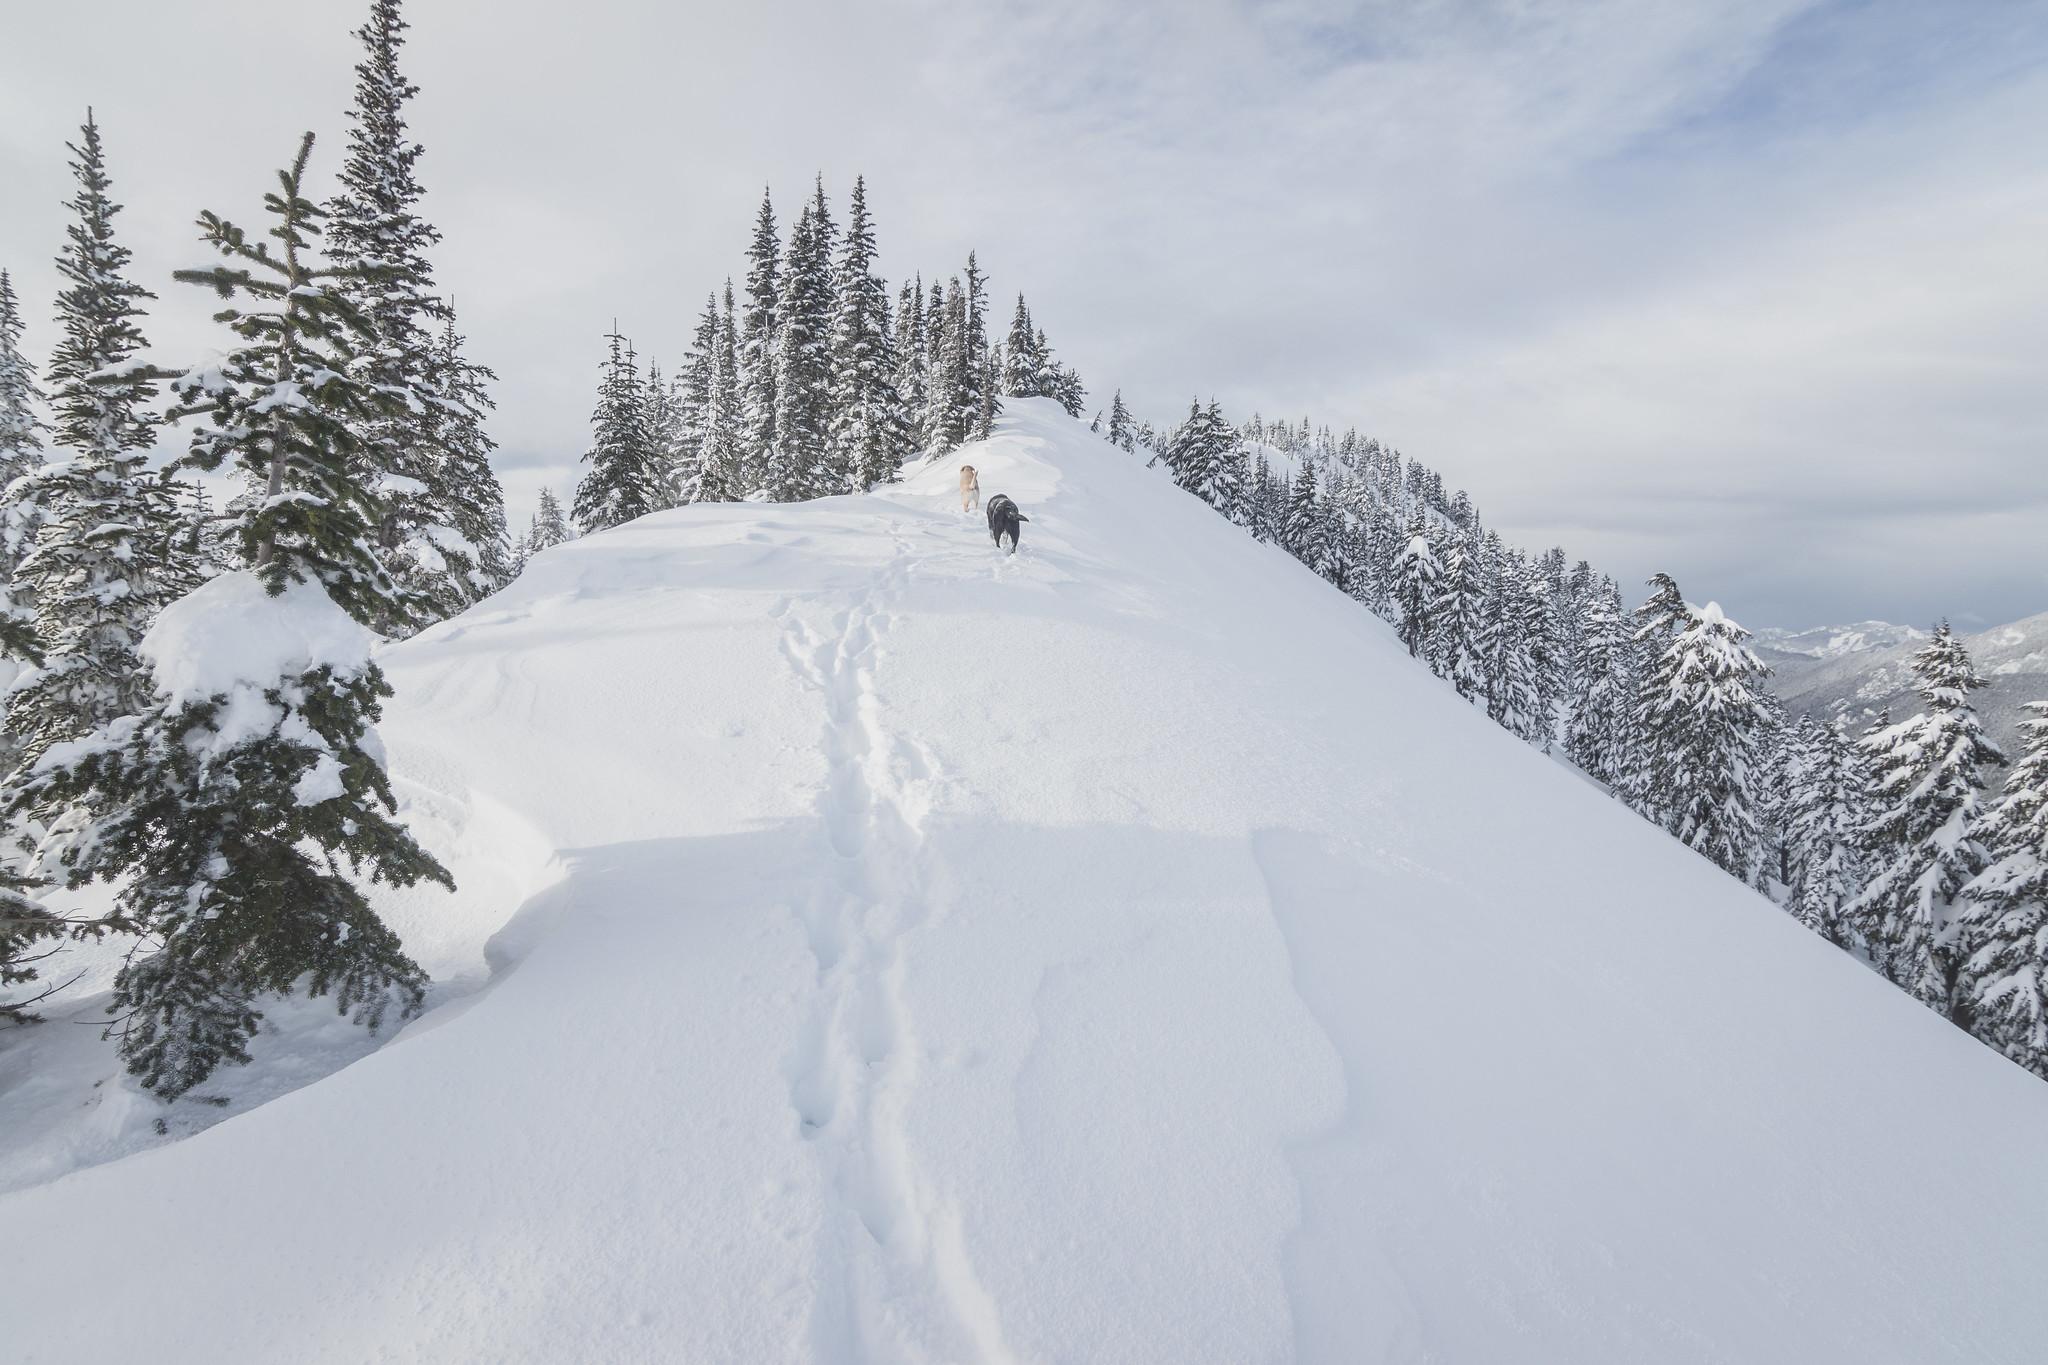 The final stretch on Pratt Mountain